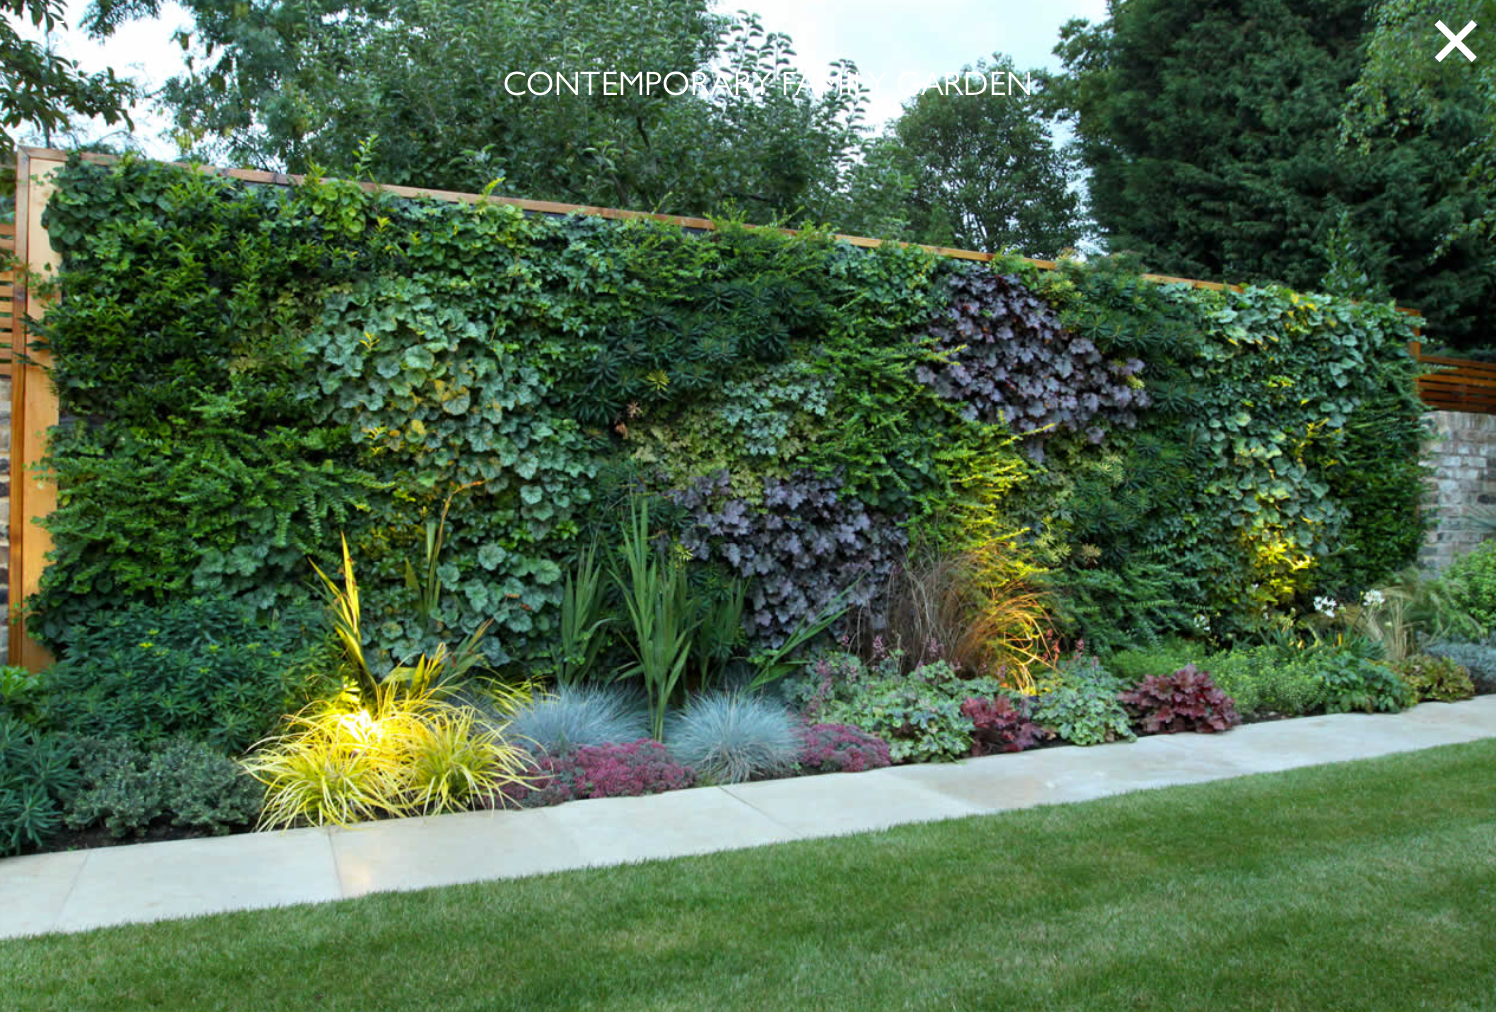 Natural garden landscape  Pin by Ulla Gardener on Gardening inspirations  Pinterest